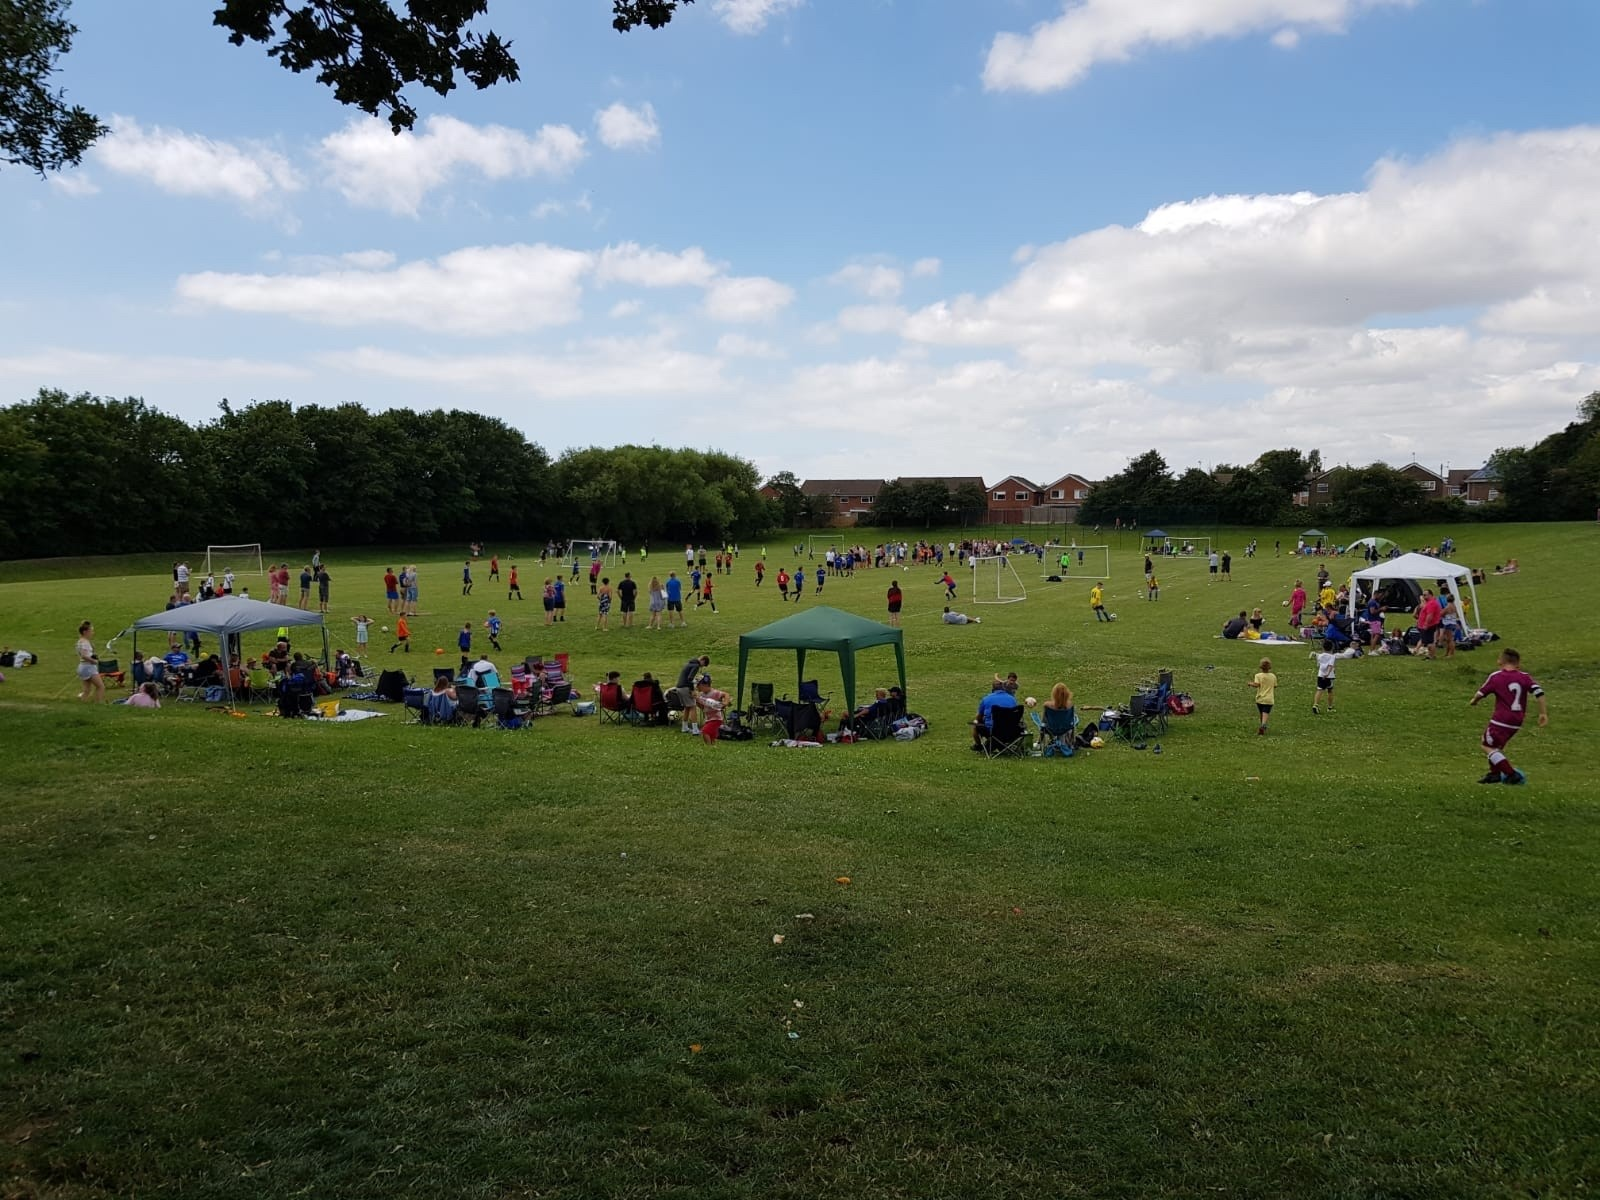 lu_youth_football_tournament_1_1600